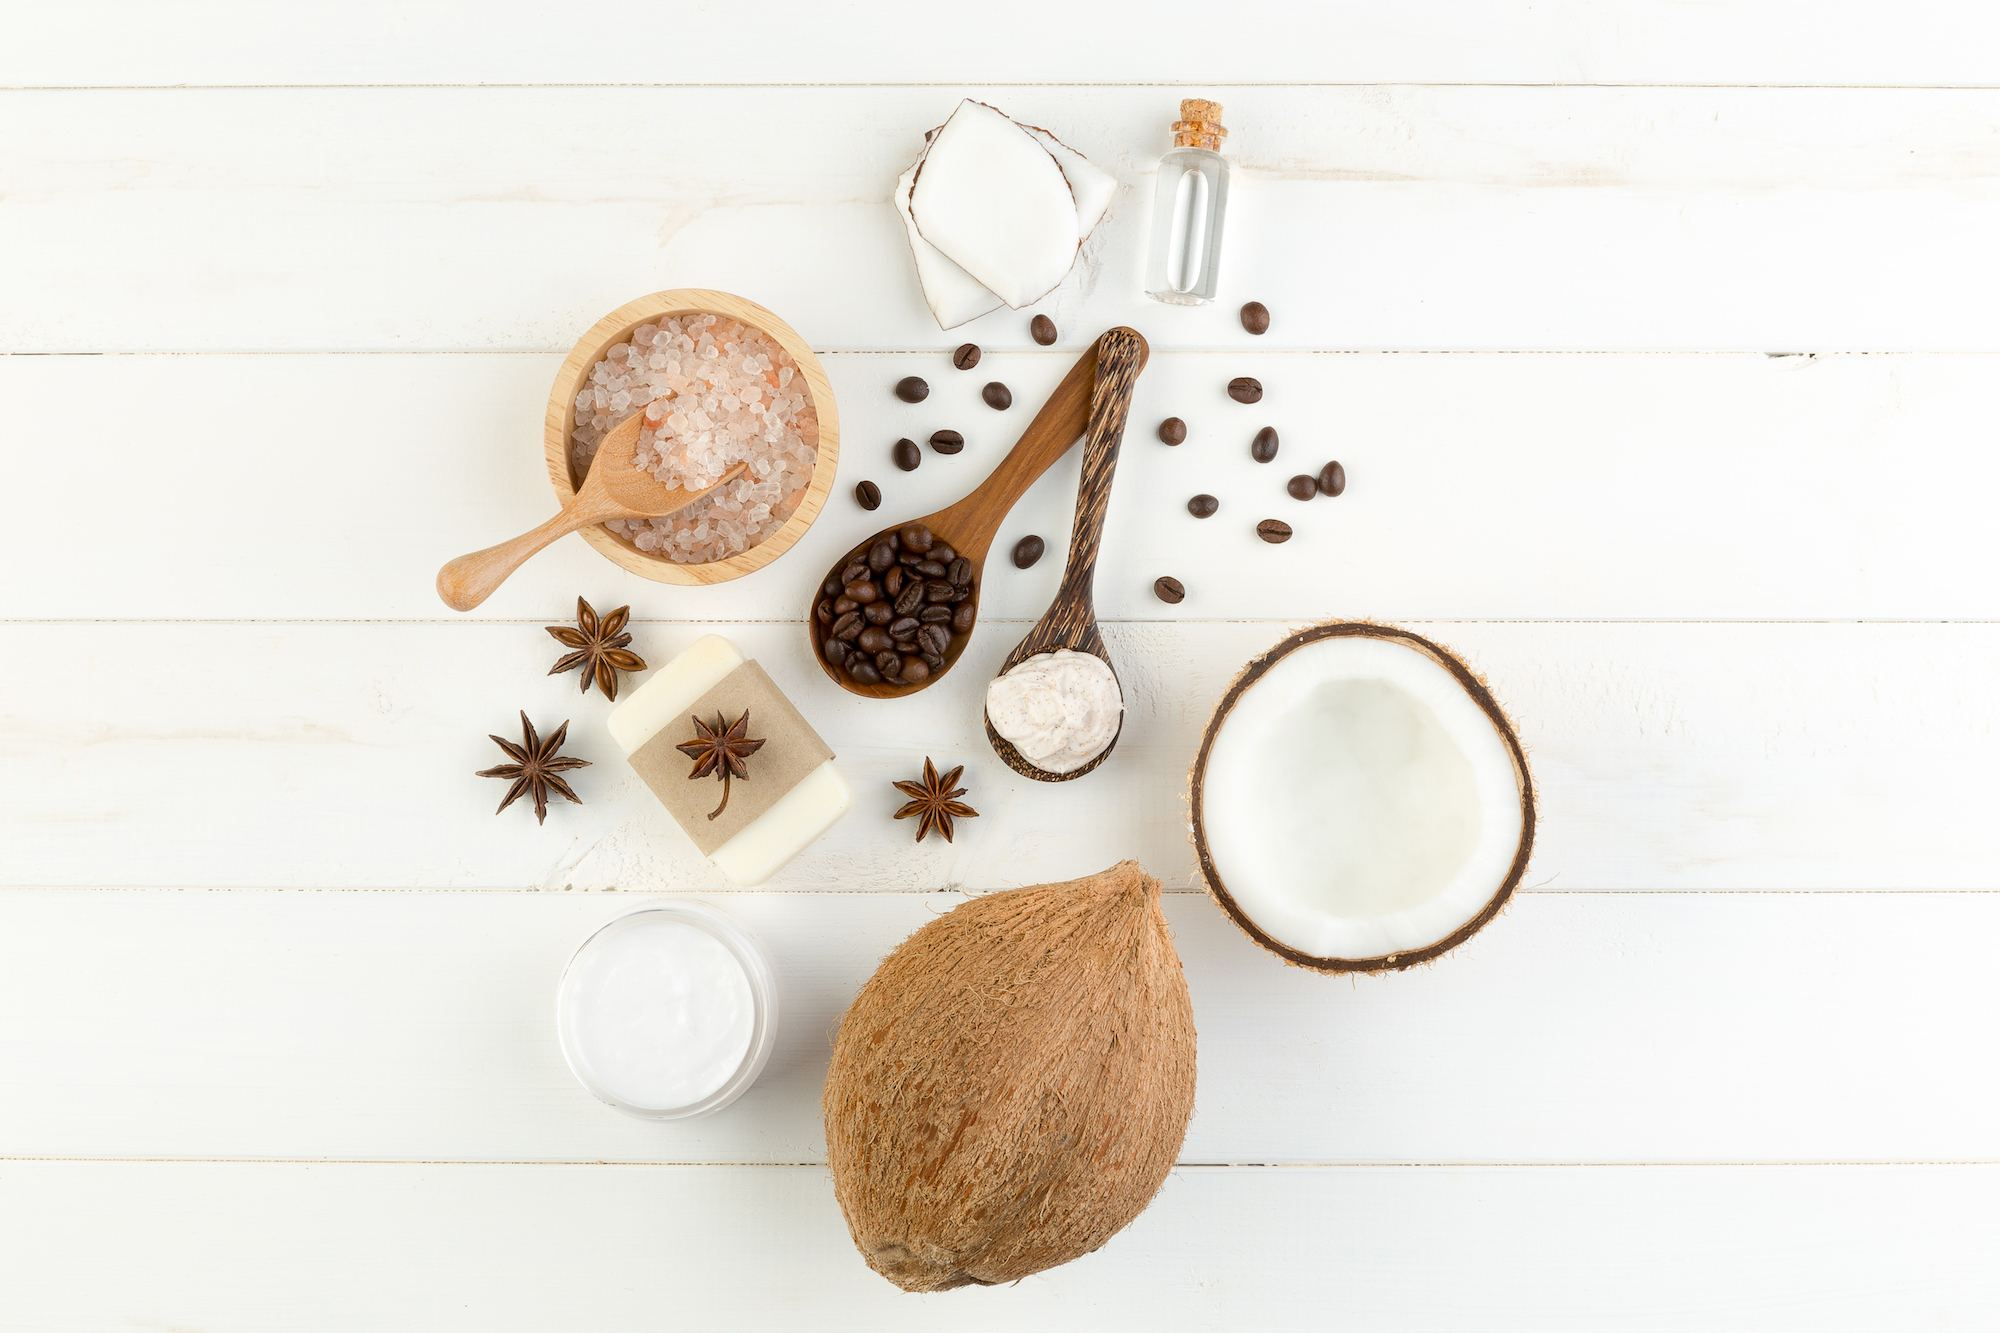 Bahan-bahan alami dari minyak kelapa